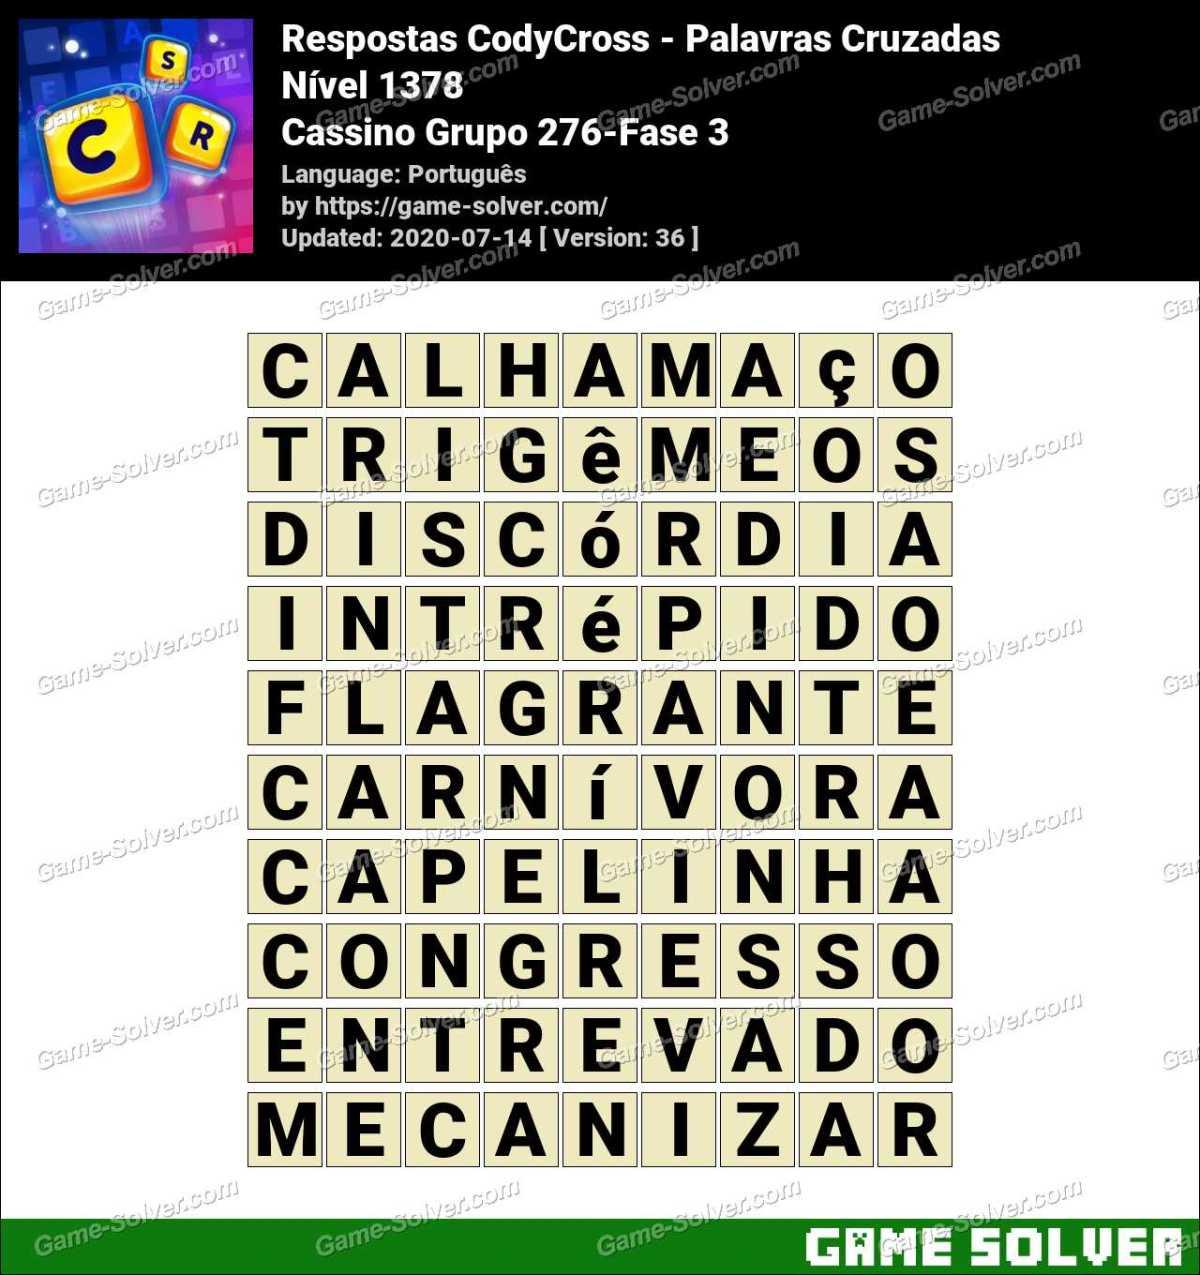 Respostas CodyCross Cassino Grupo 276-Fase 3